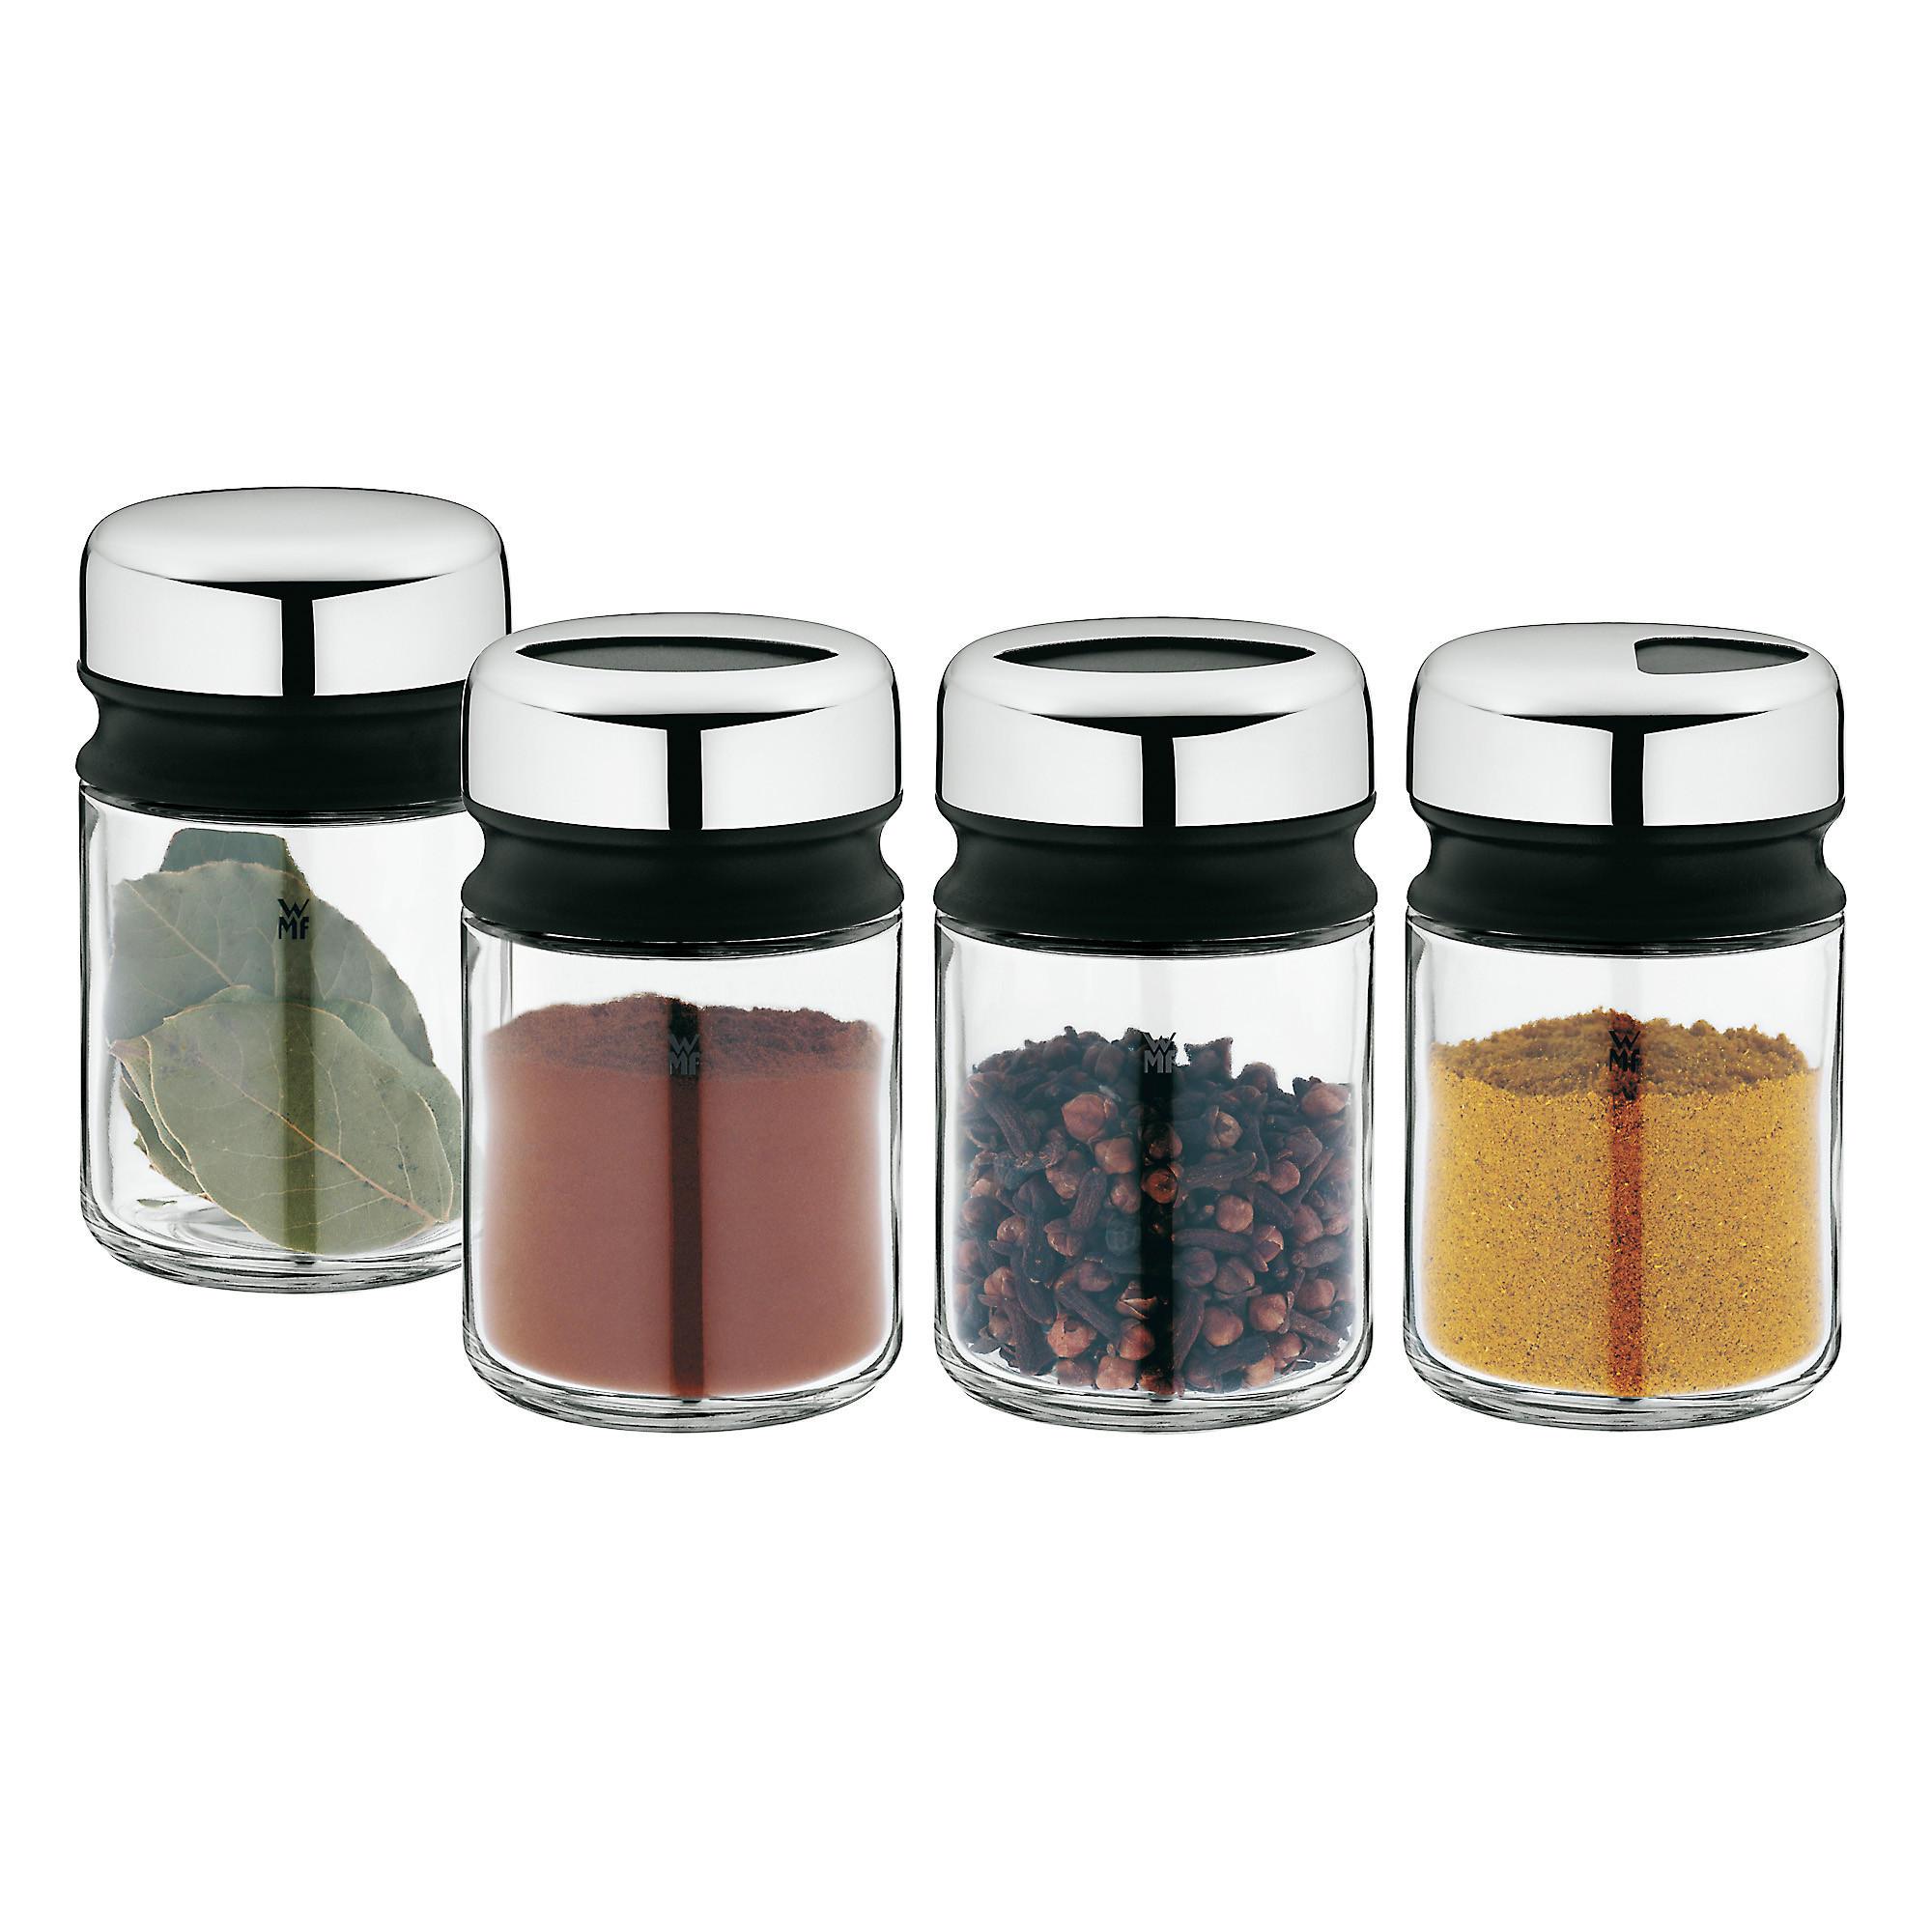 Gewürzdose 4-teilig - Klar/Edelstahlfarben, Basics, Glas/Keramik (5,5/9,5cm) - WMF